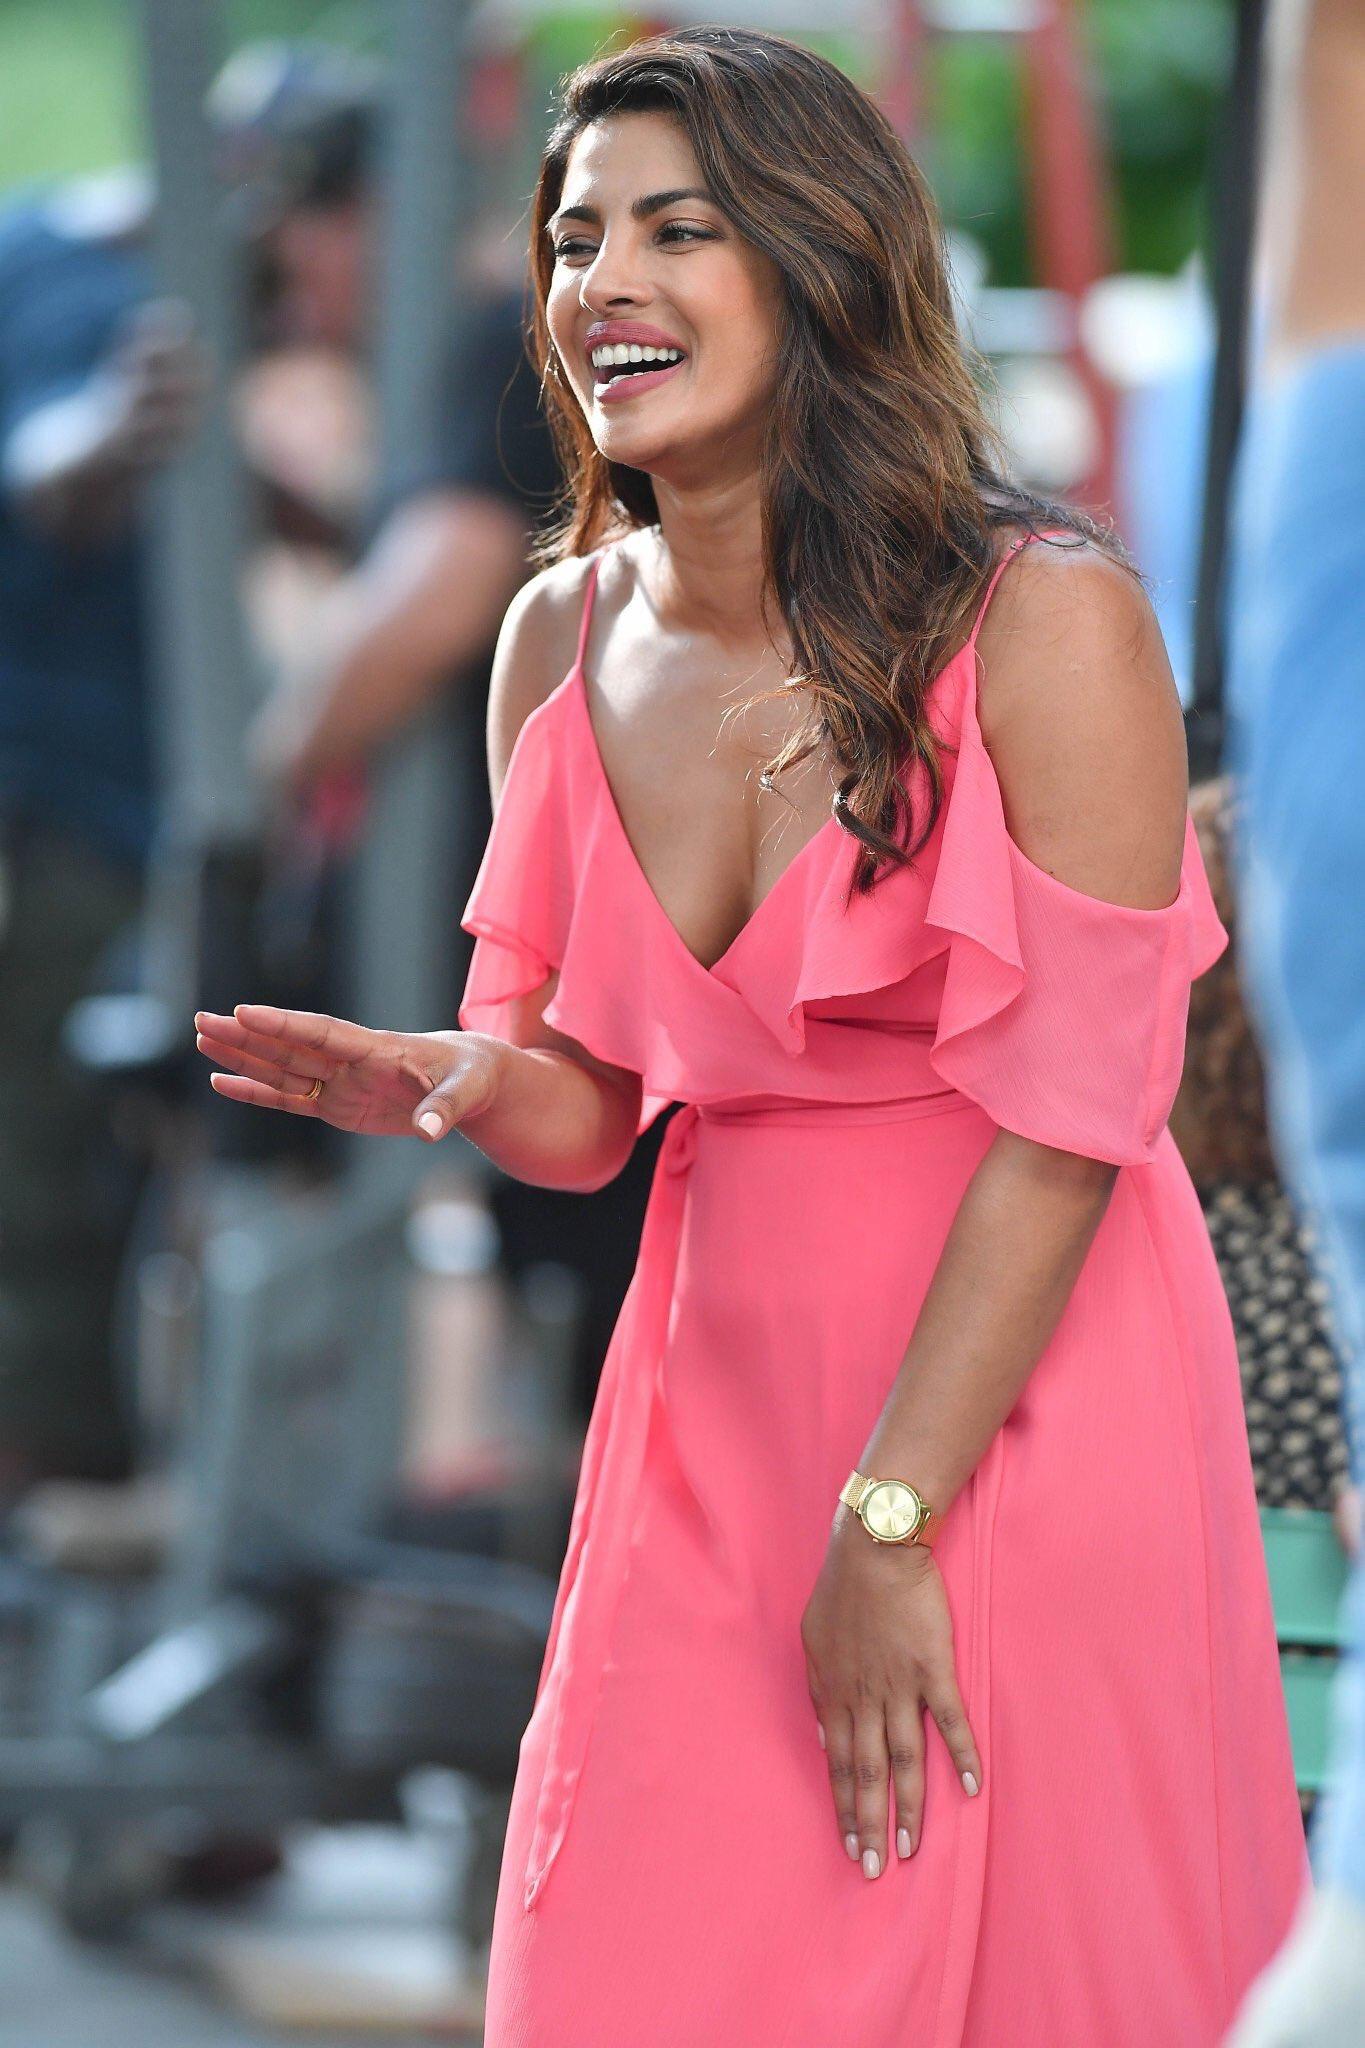 Priyanka Chopra Pink Dress Ultra Hd Latest Photos Leaked 2017 Pc